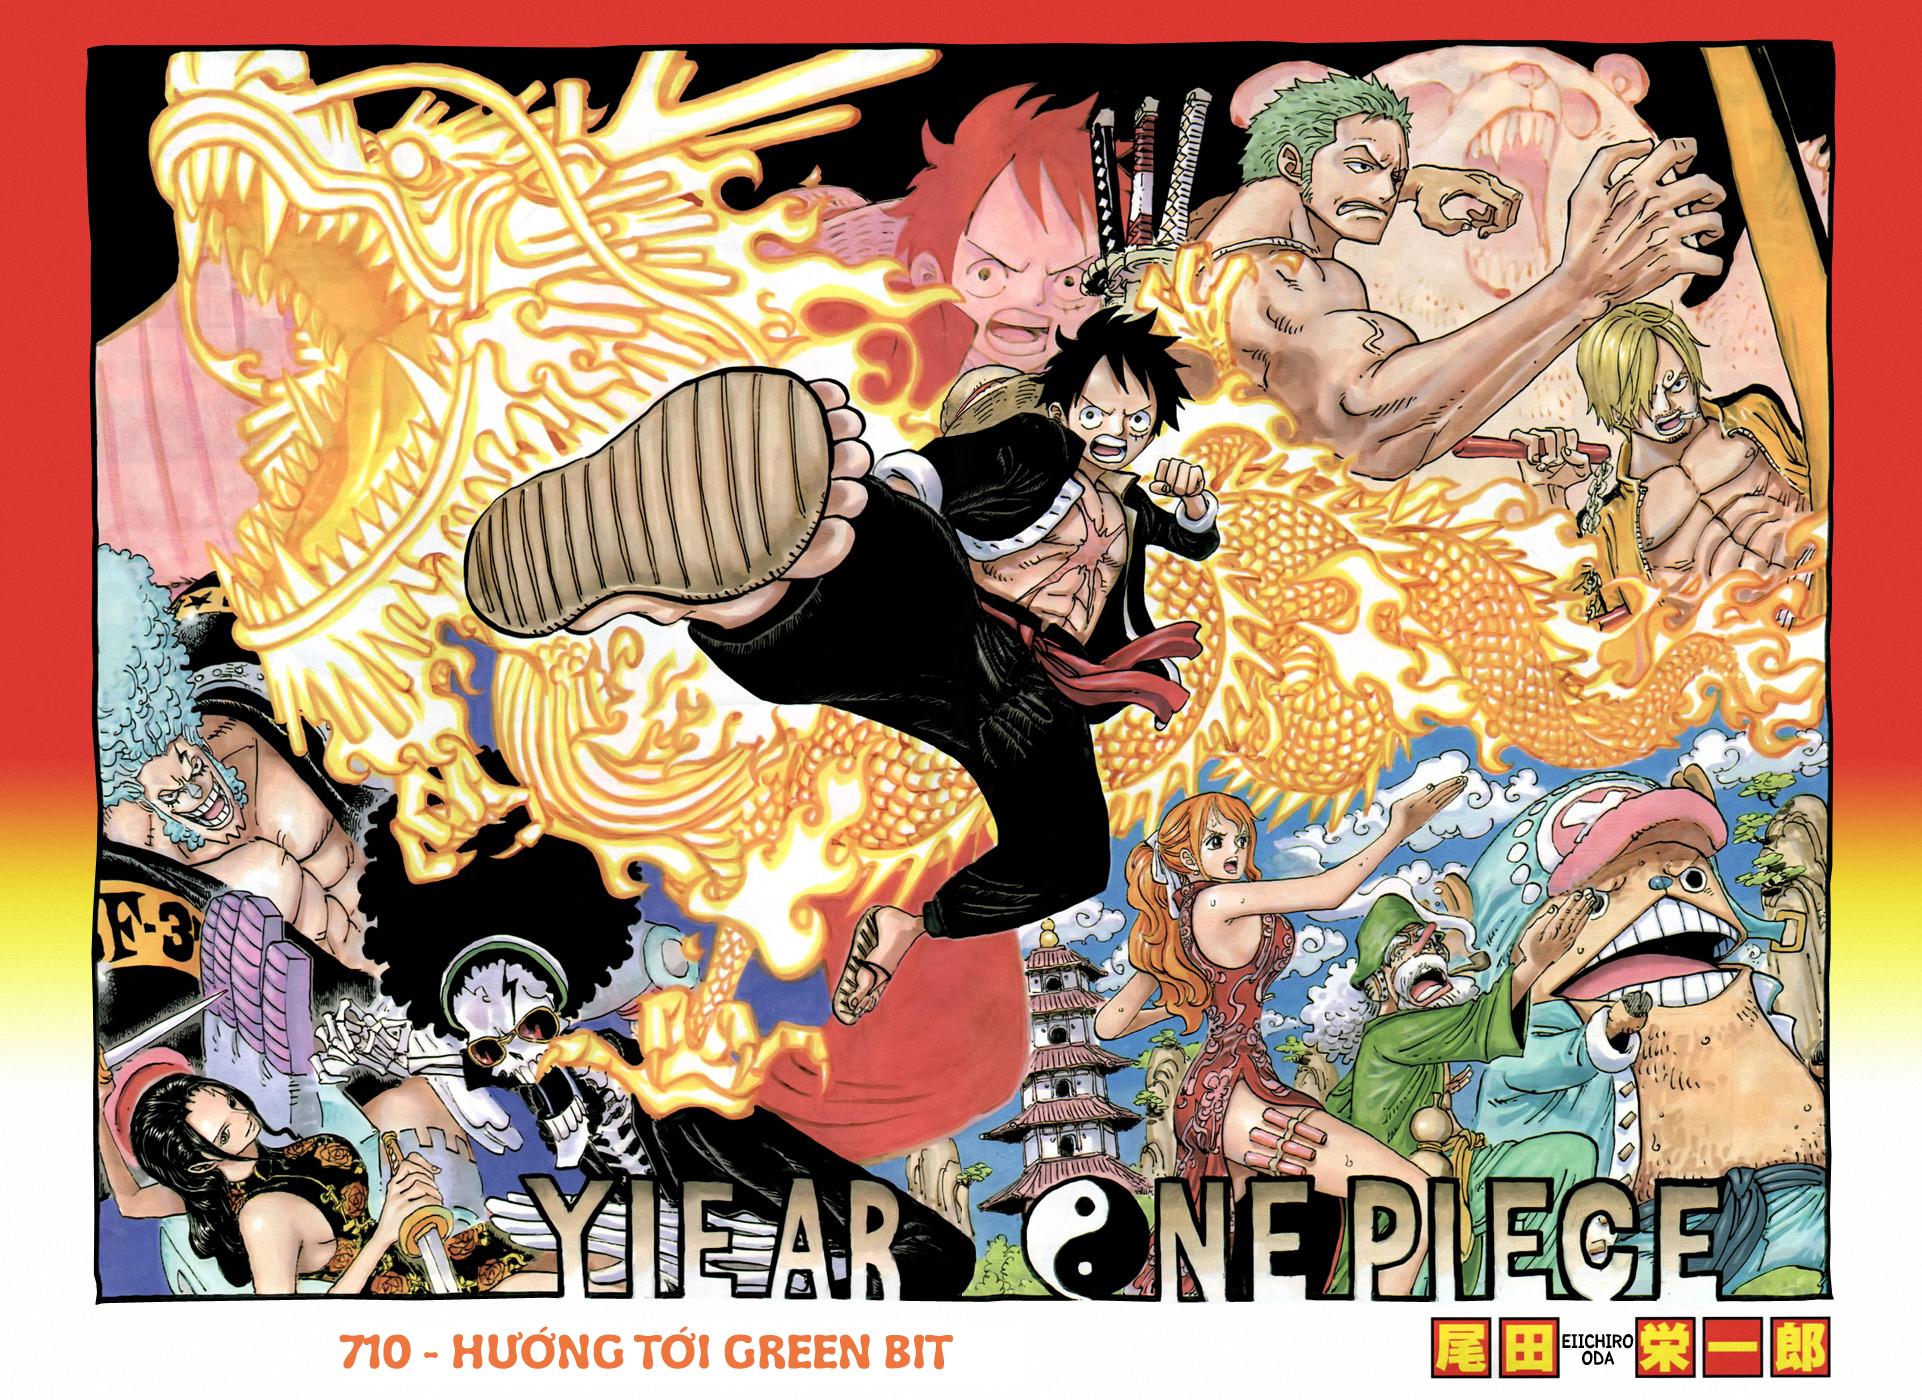 One Piece Chapter 710: Hướng tới Green Bit 002